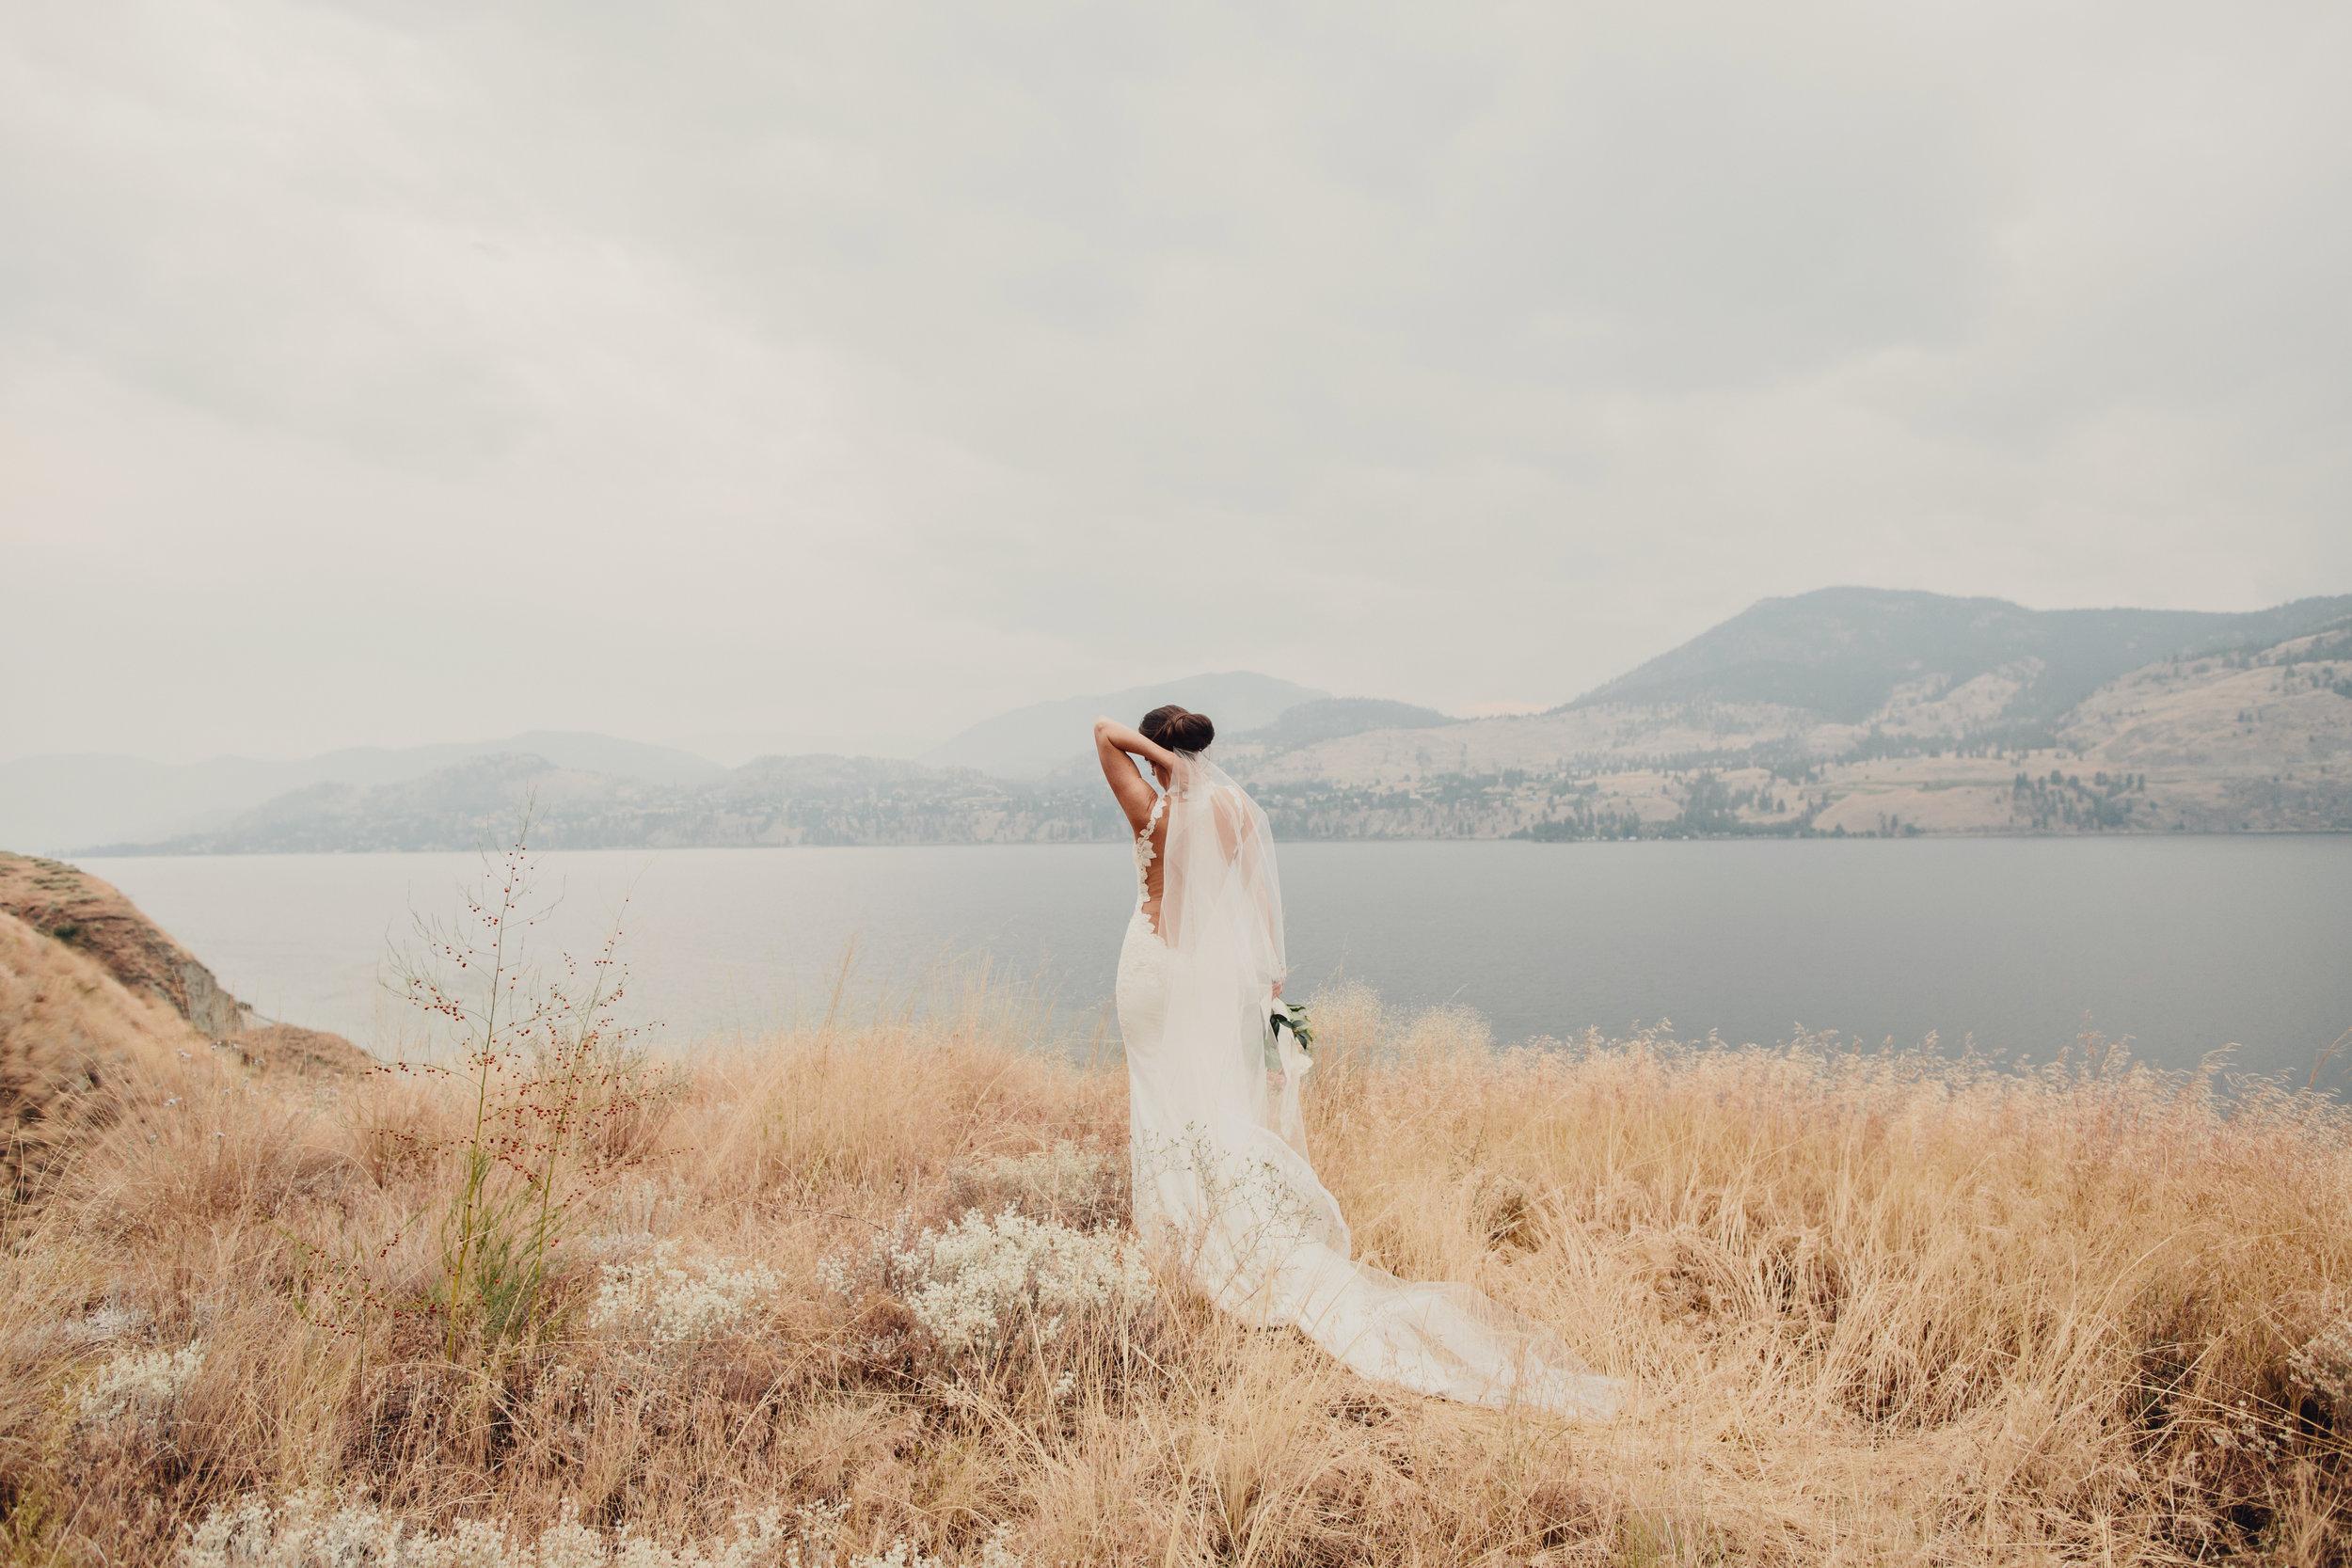 taylor-roades-wedding-0109.JPG